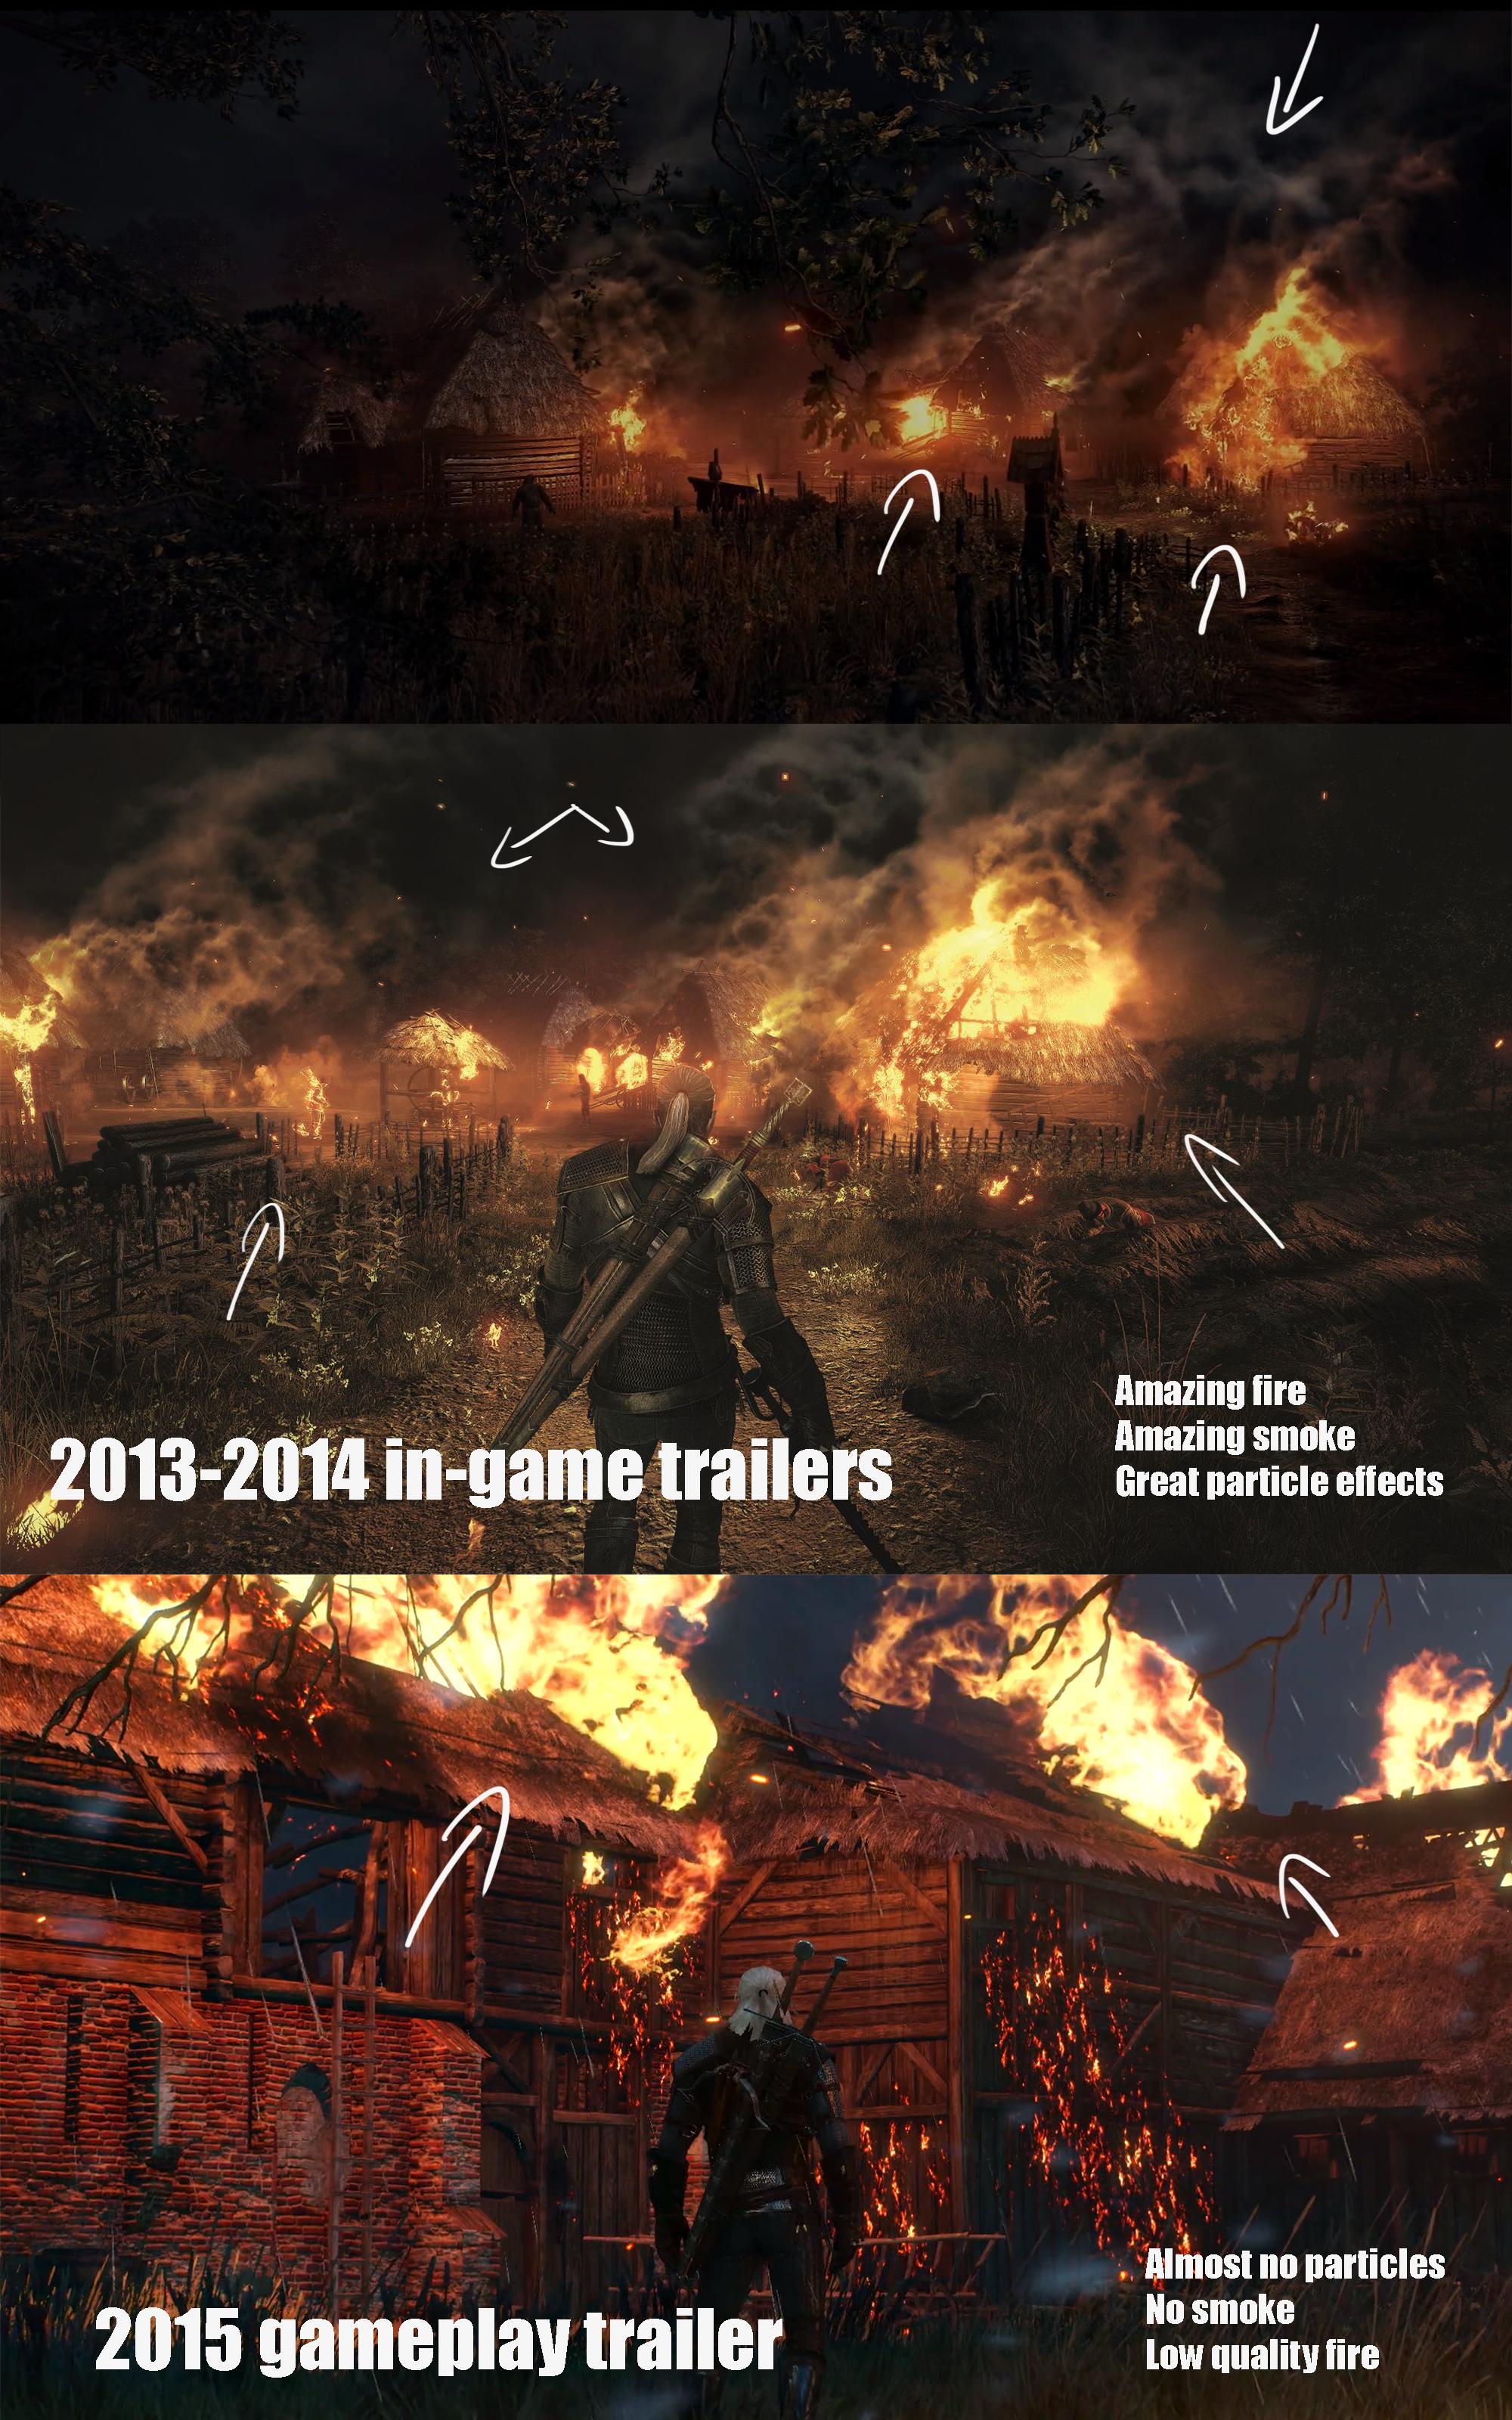 ... качество графики в The Witcher 3: Wild Hunt: empire-of-games.ru/art_32656.html